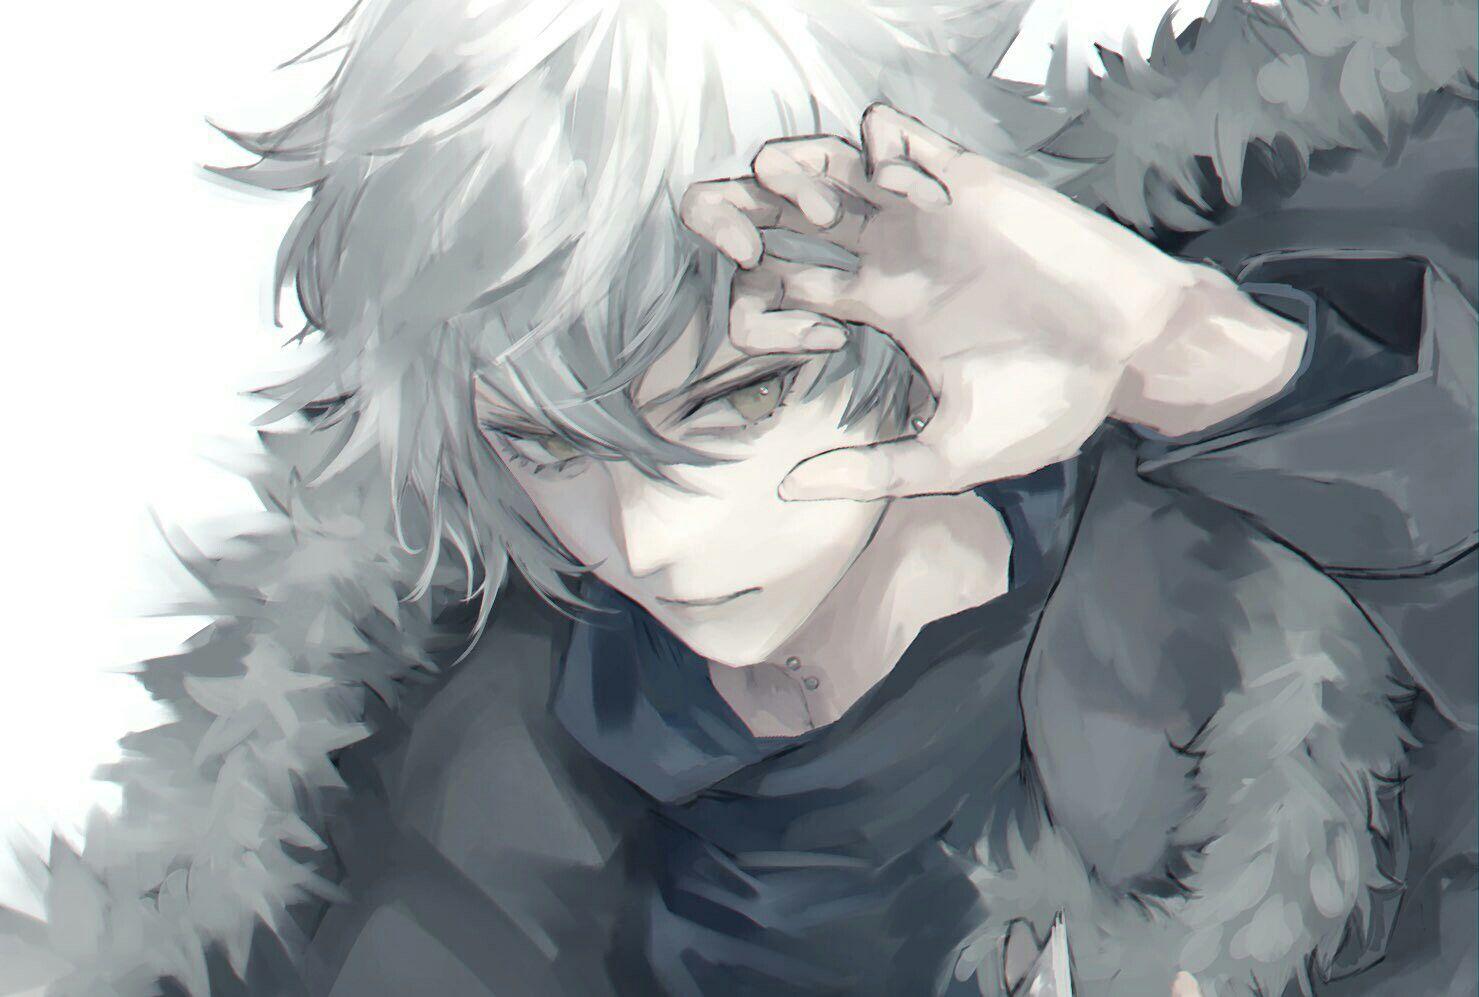 Kadoc Zemlupus Fate Grand Order Anime, Anime guys